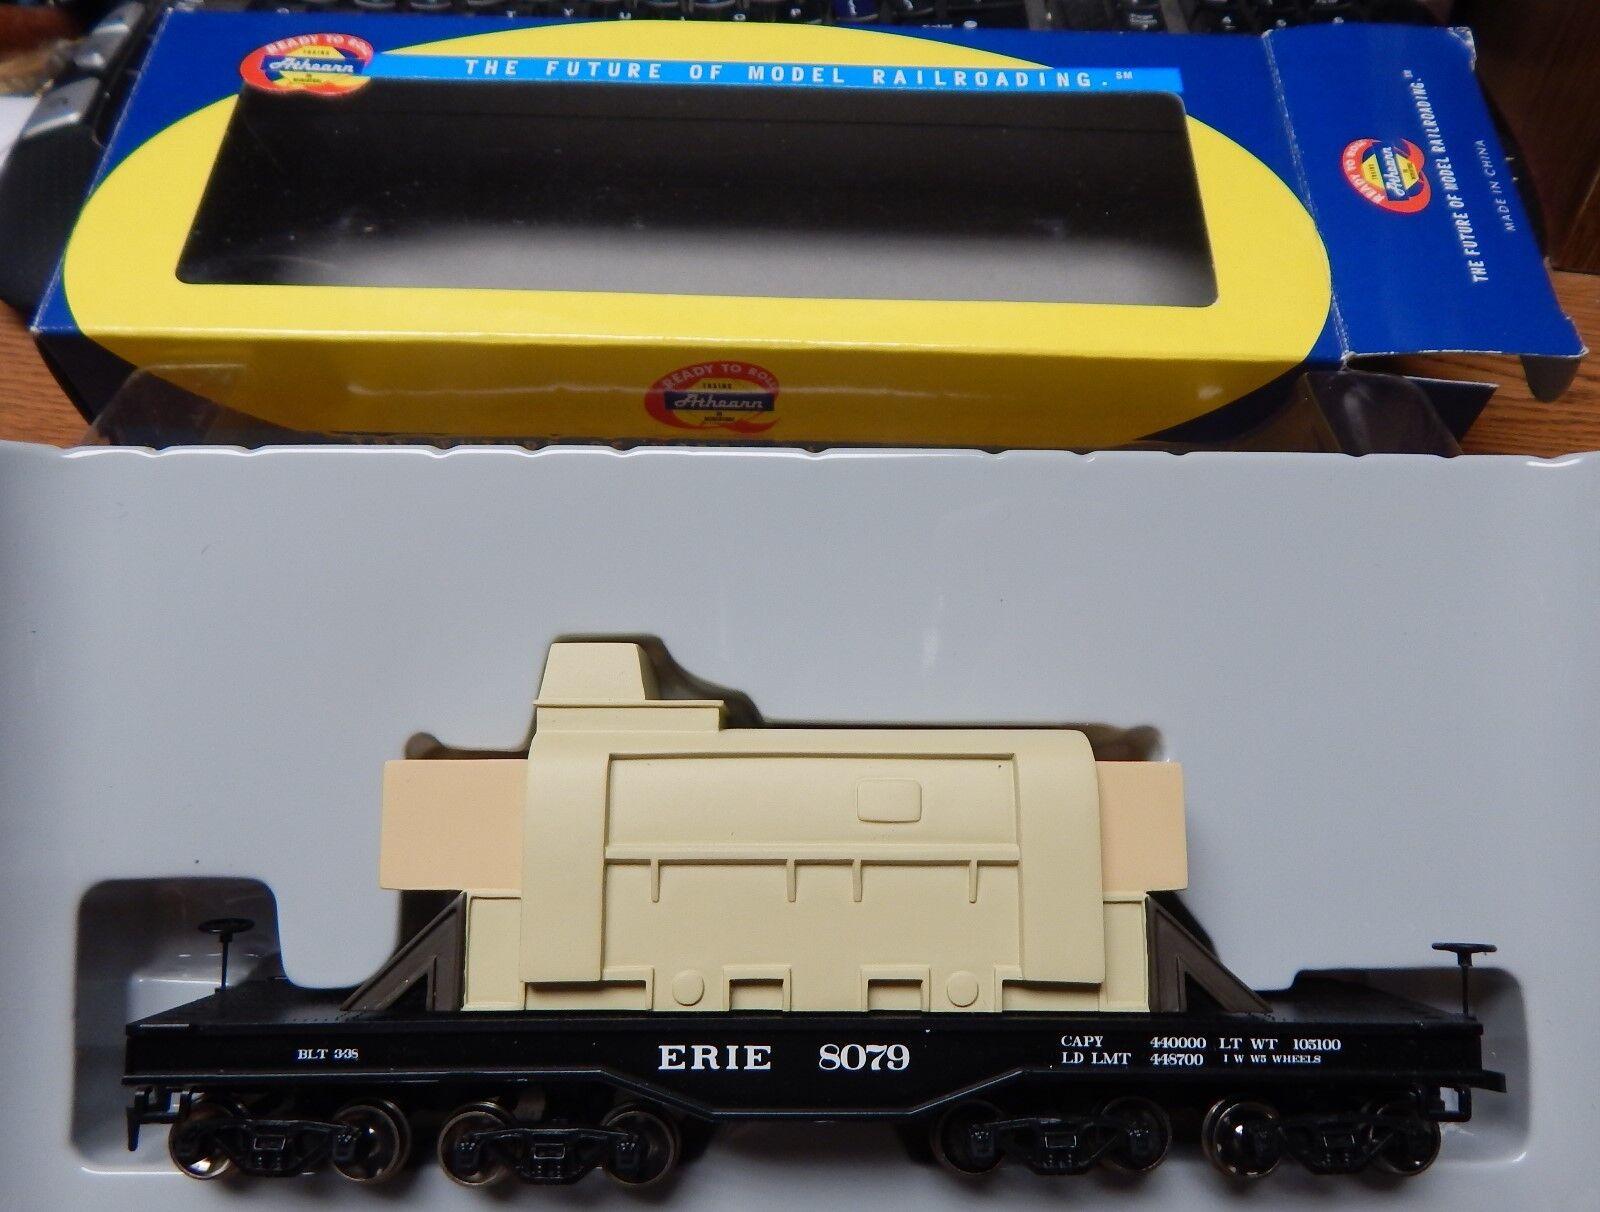 ATHEARN 92242 ERIE HEAVY DUTY FLAT CAR W LOAD USED IN BOX HO SCALE NICE